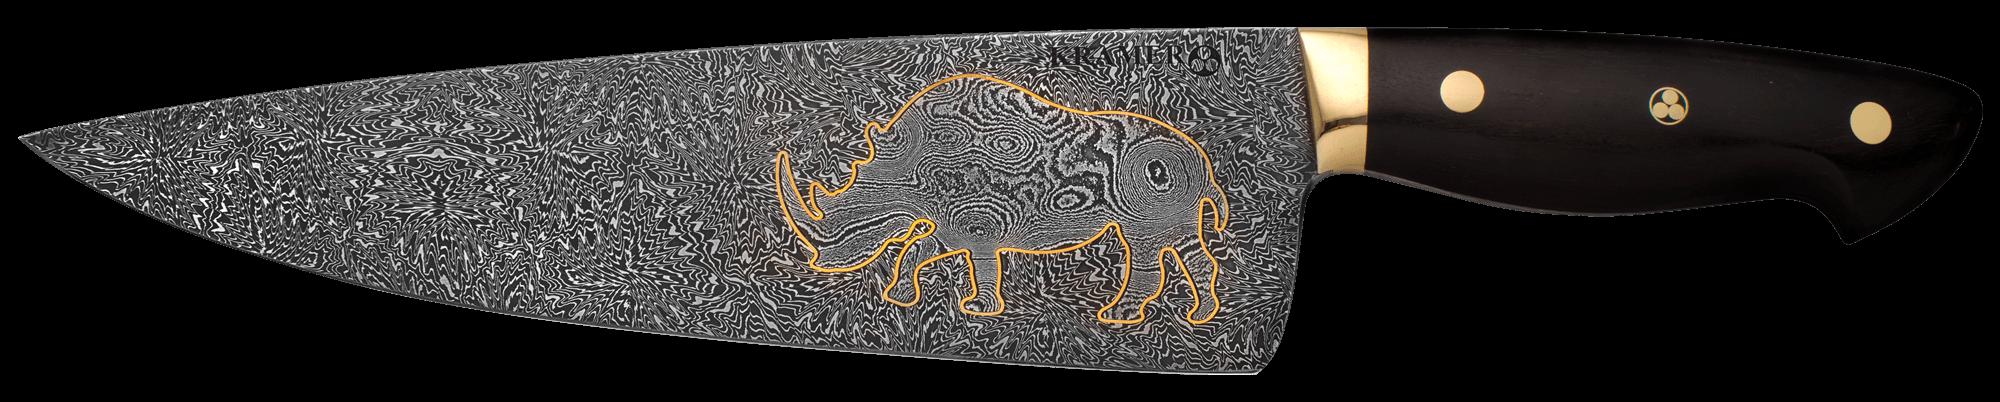 rhino-left-1-2000